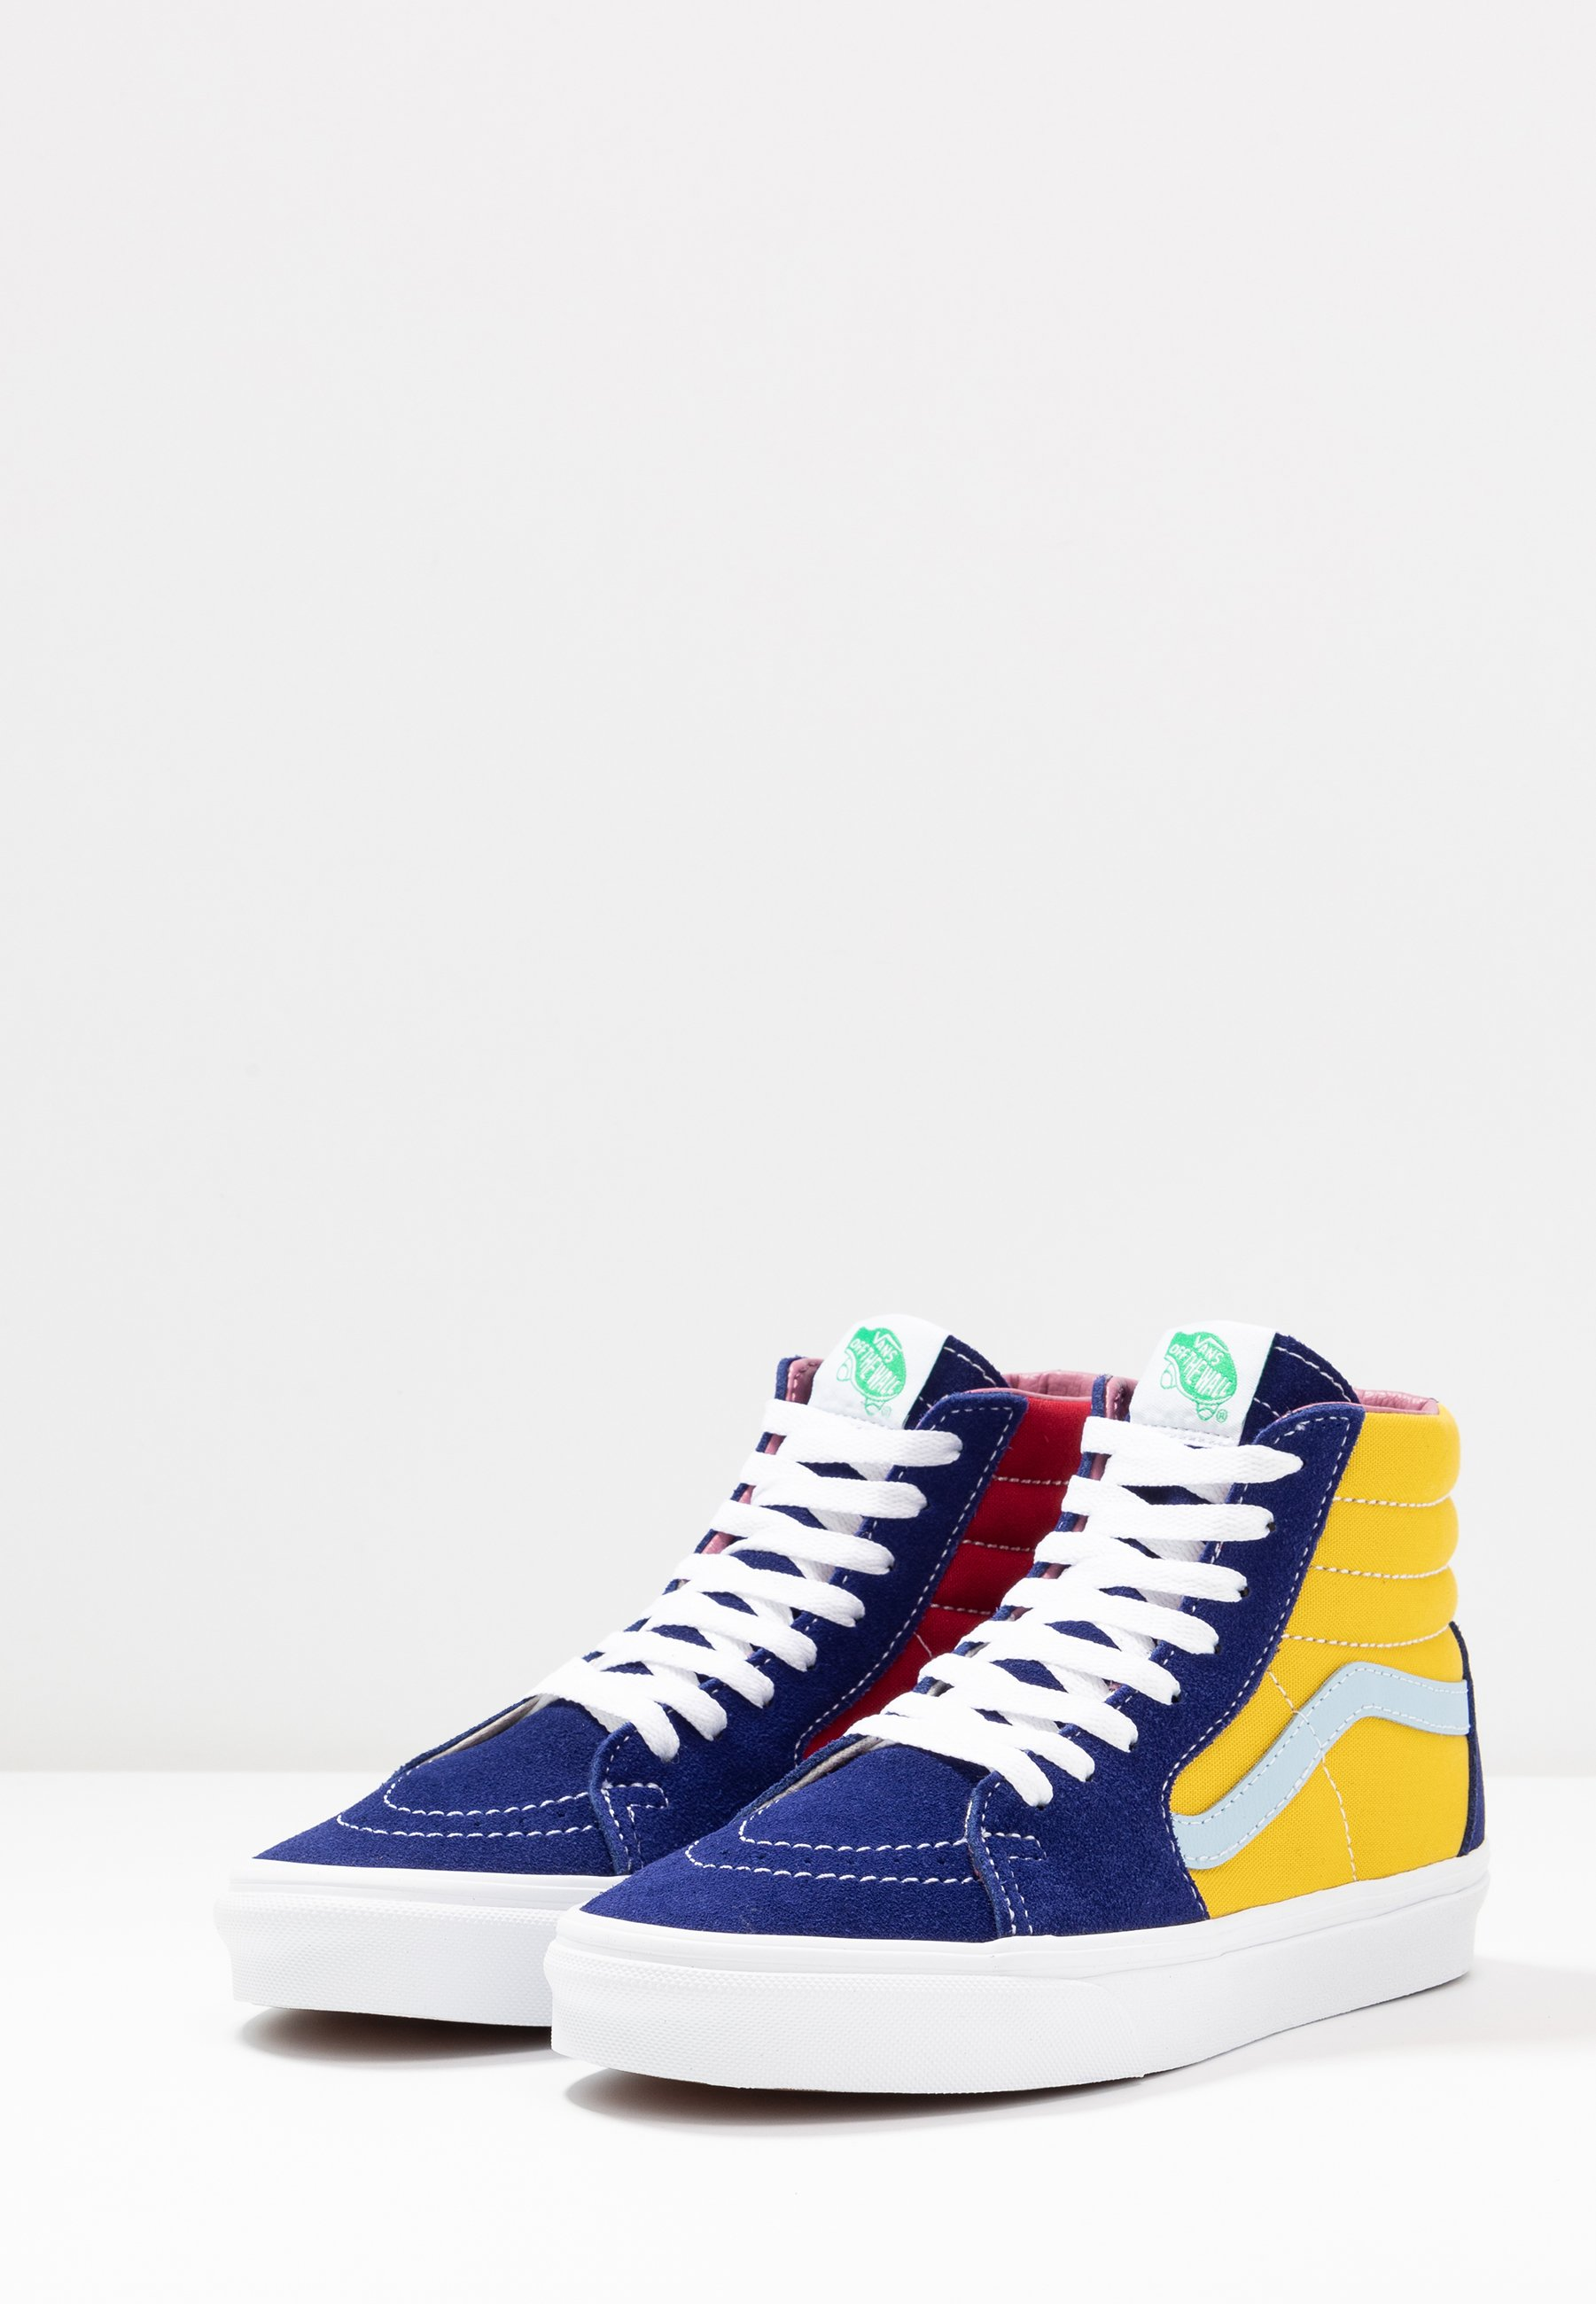 SK8 Höga sneakers sunshinemulticolortrue white